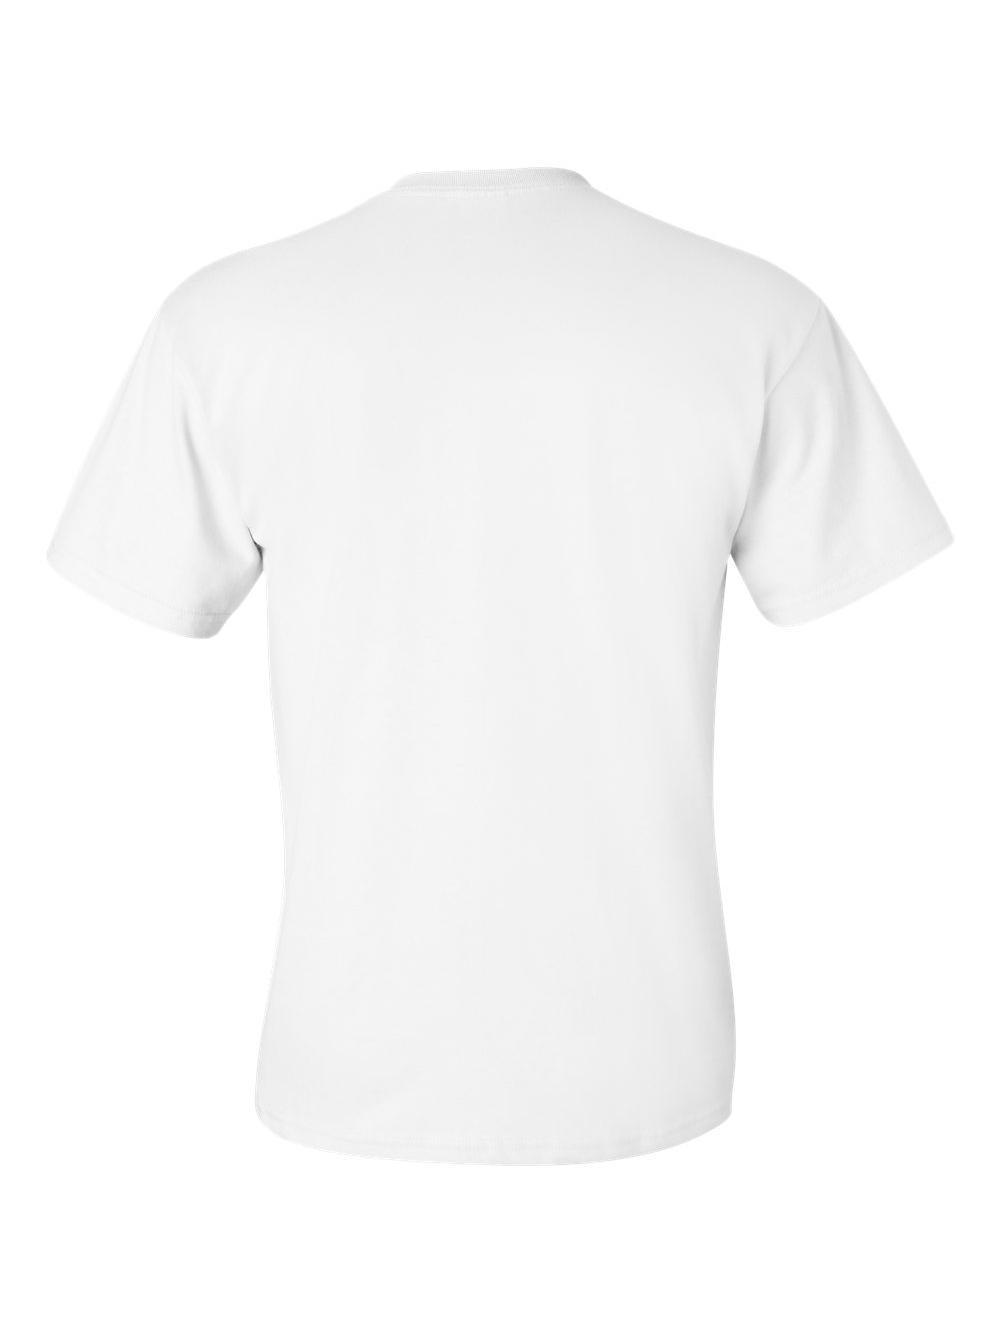 Gildan-Ultra-Cotton-T-Shirt-with-a-Pocket-2300 thumbnail 46